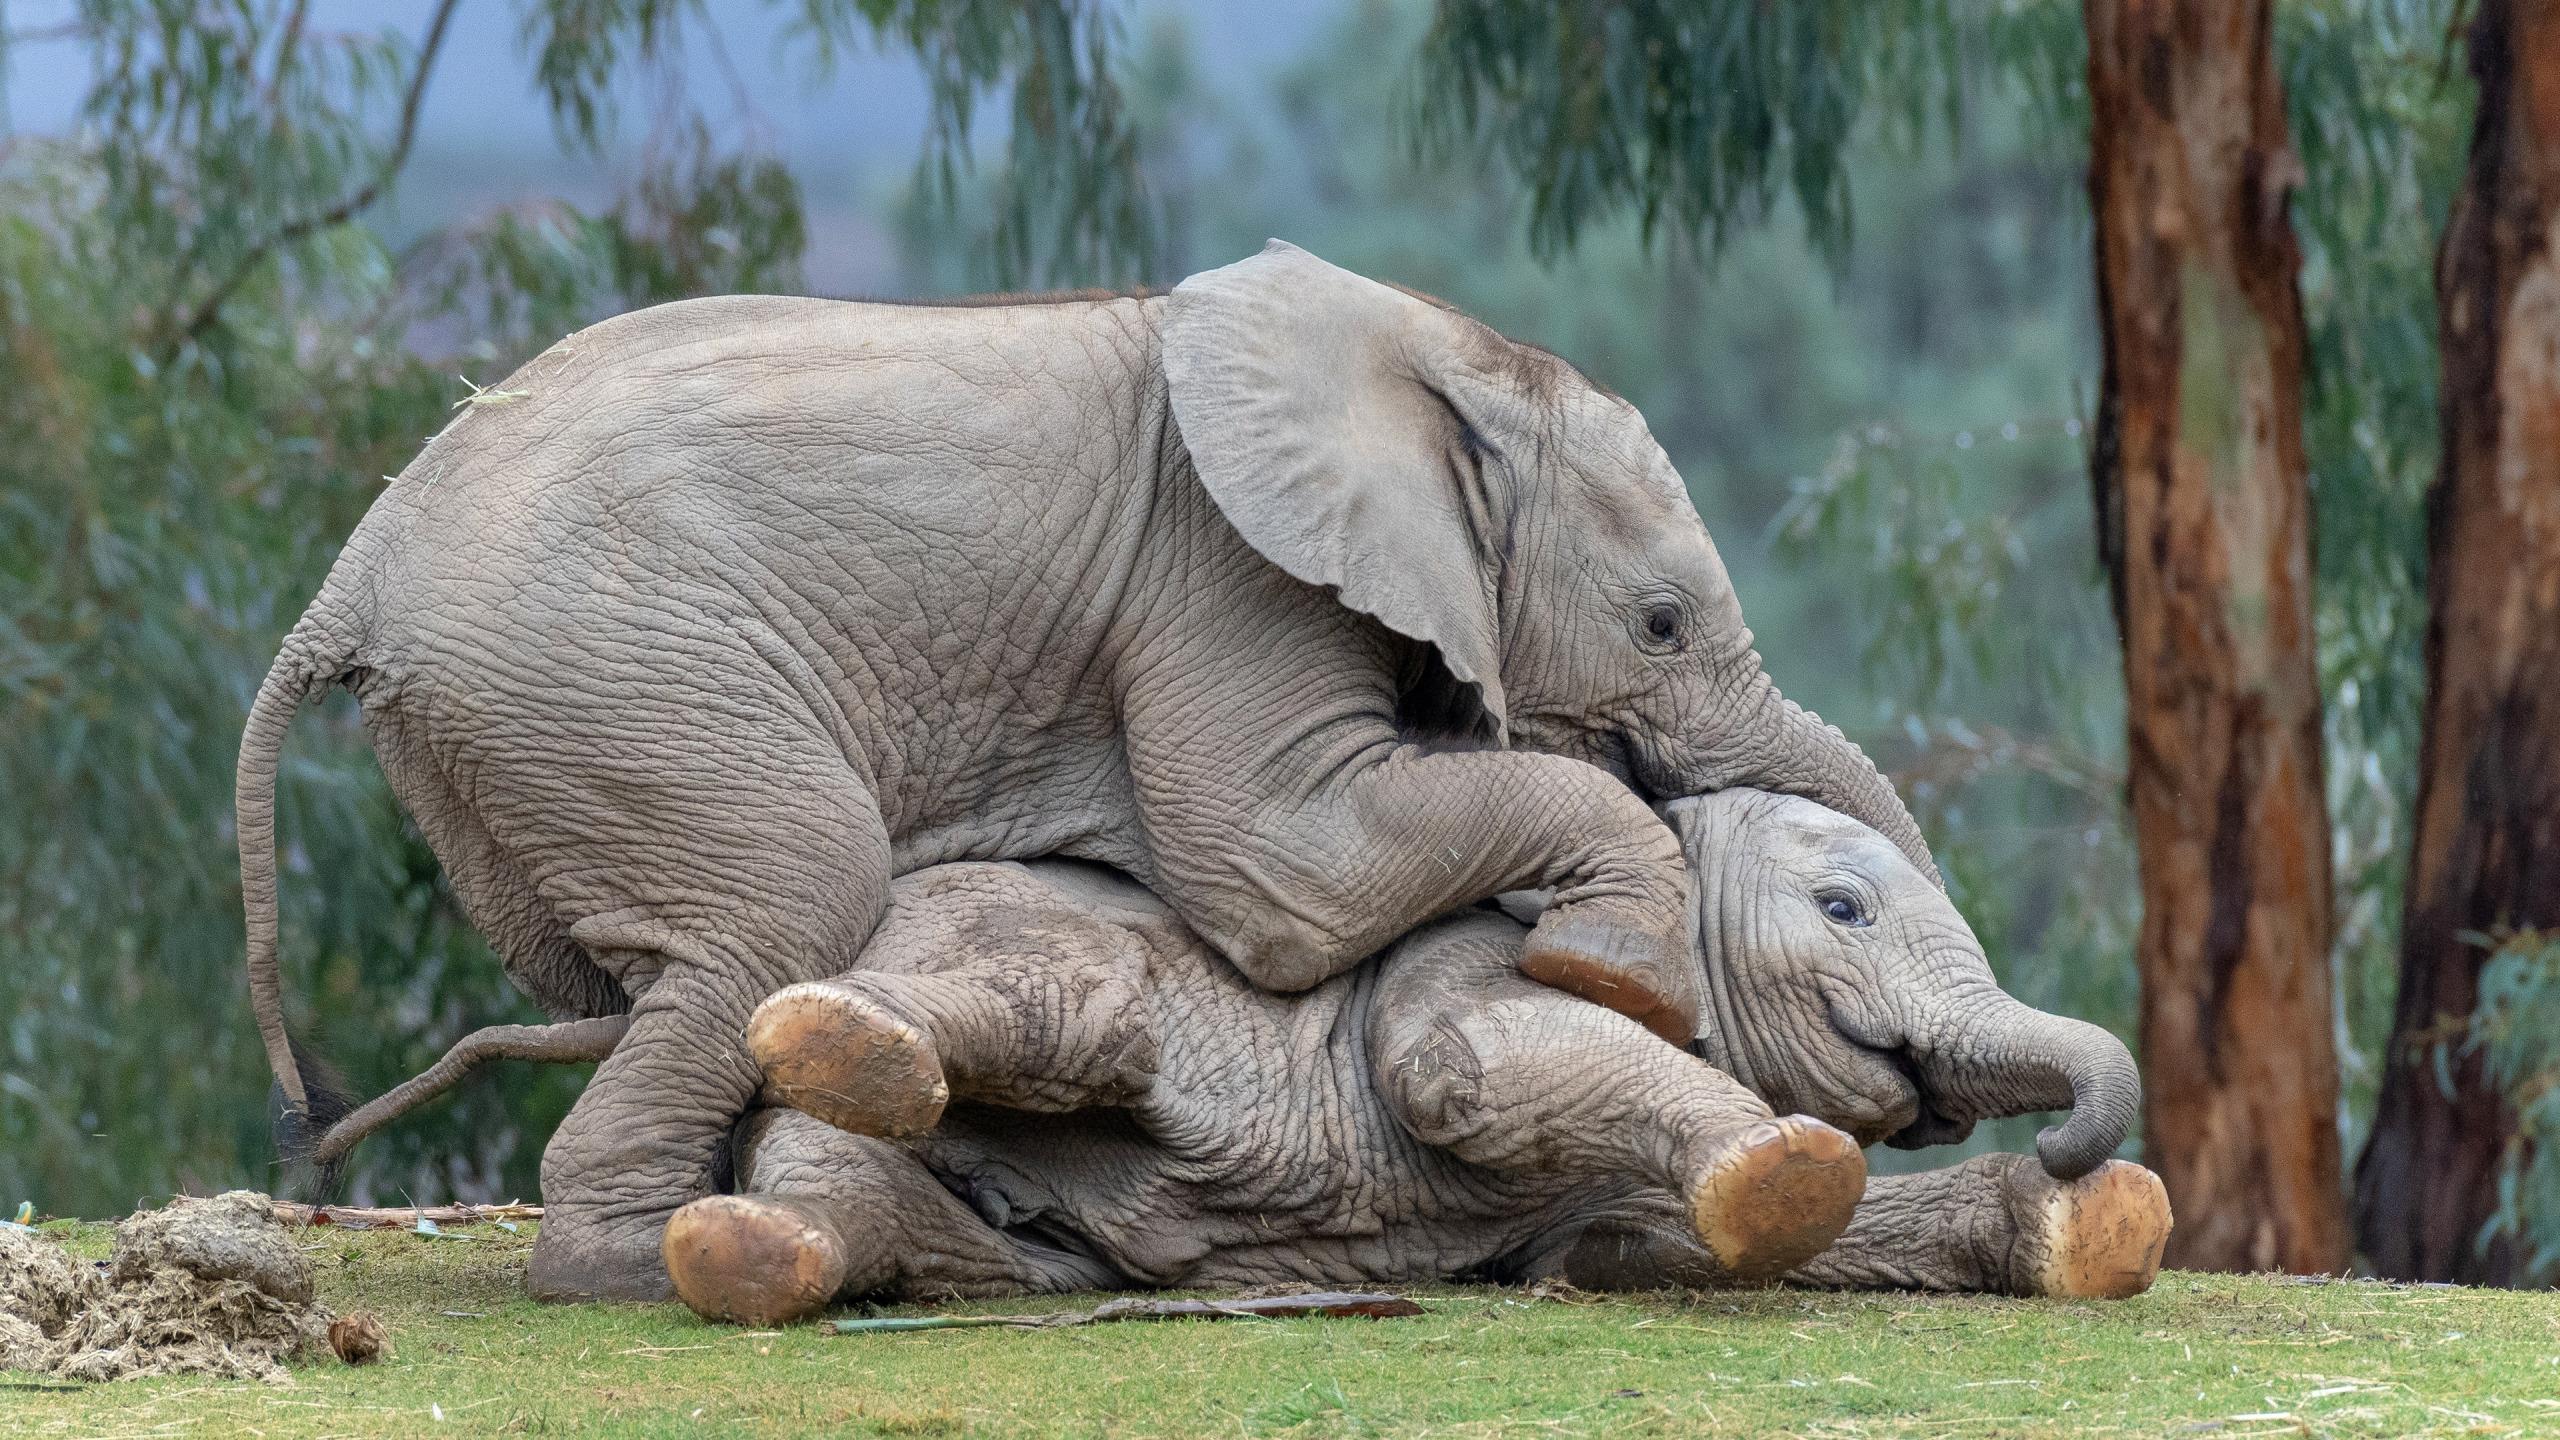 два слоненка картинка система рпс